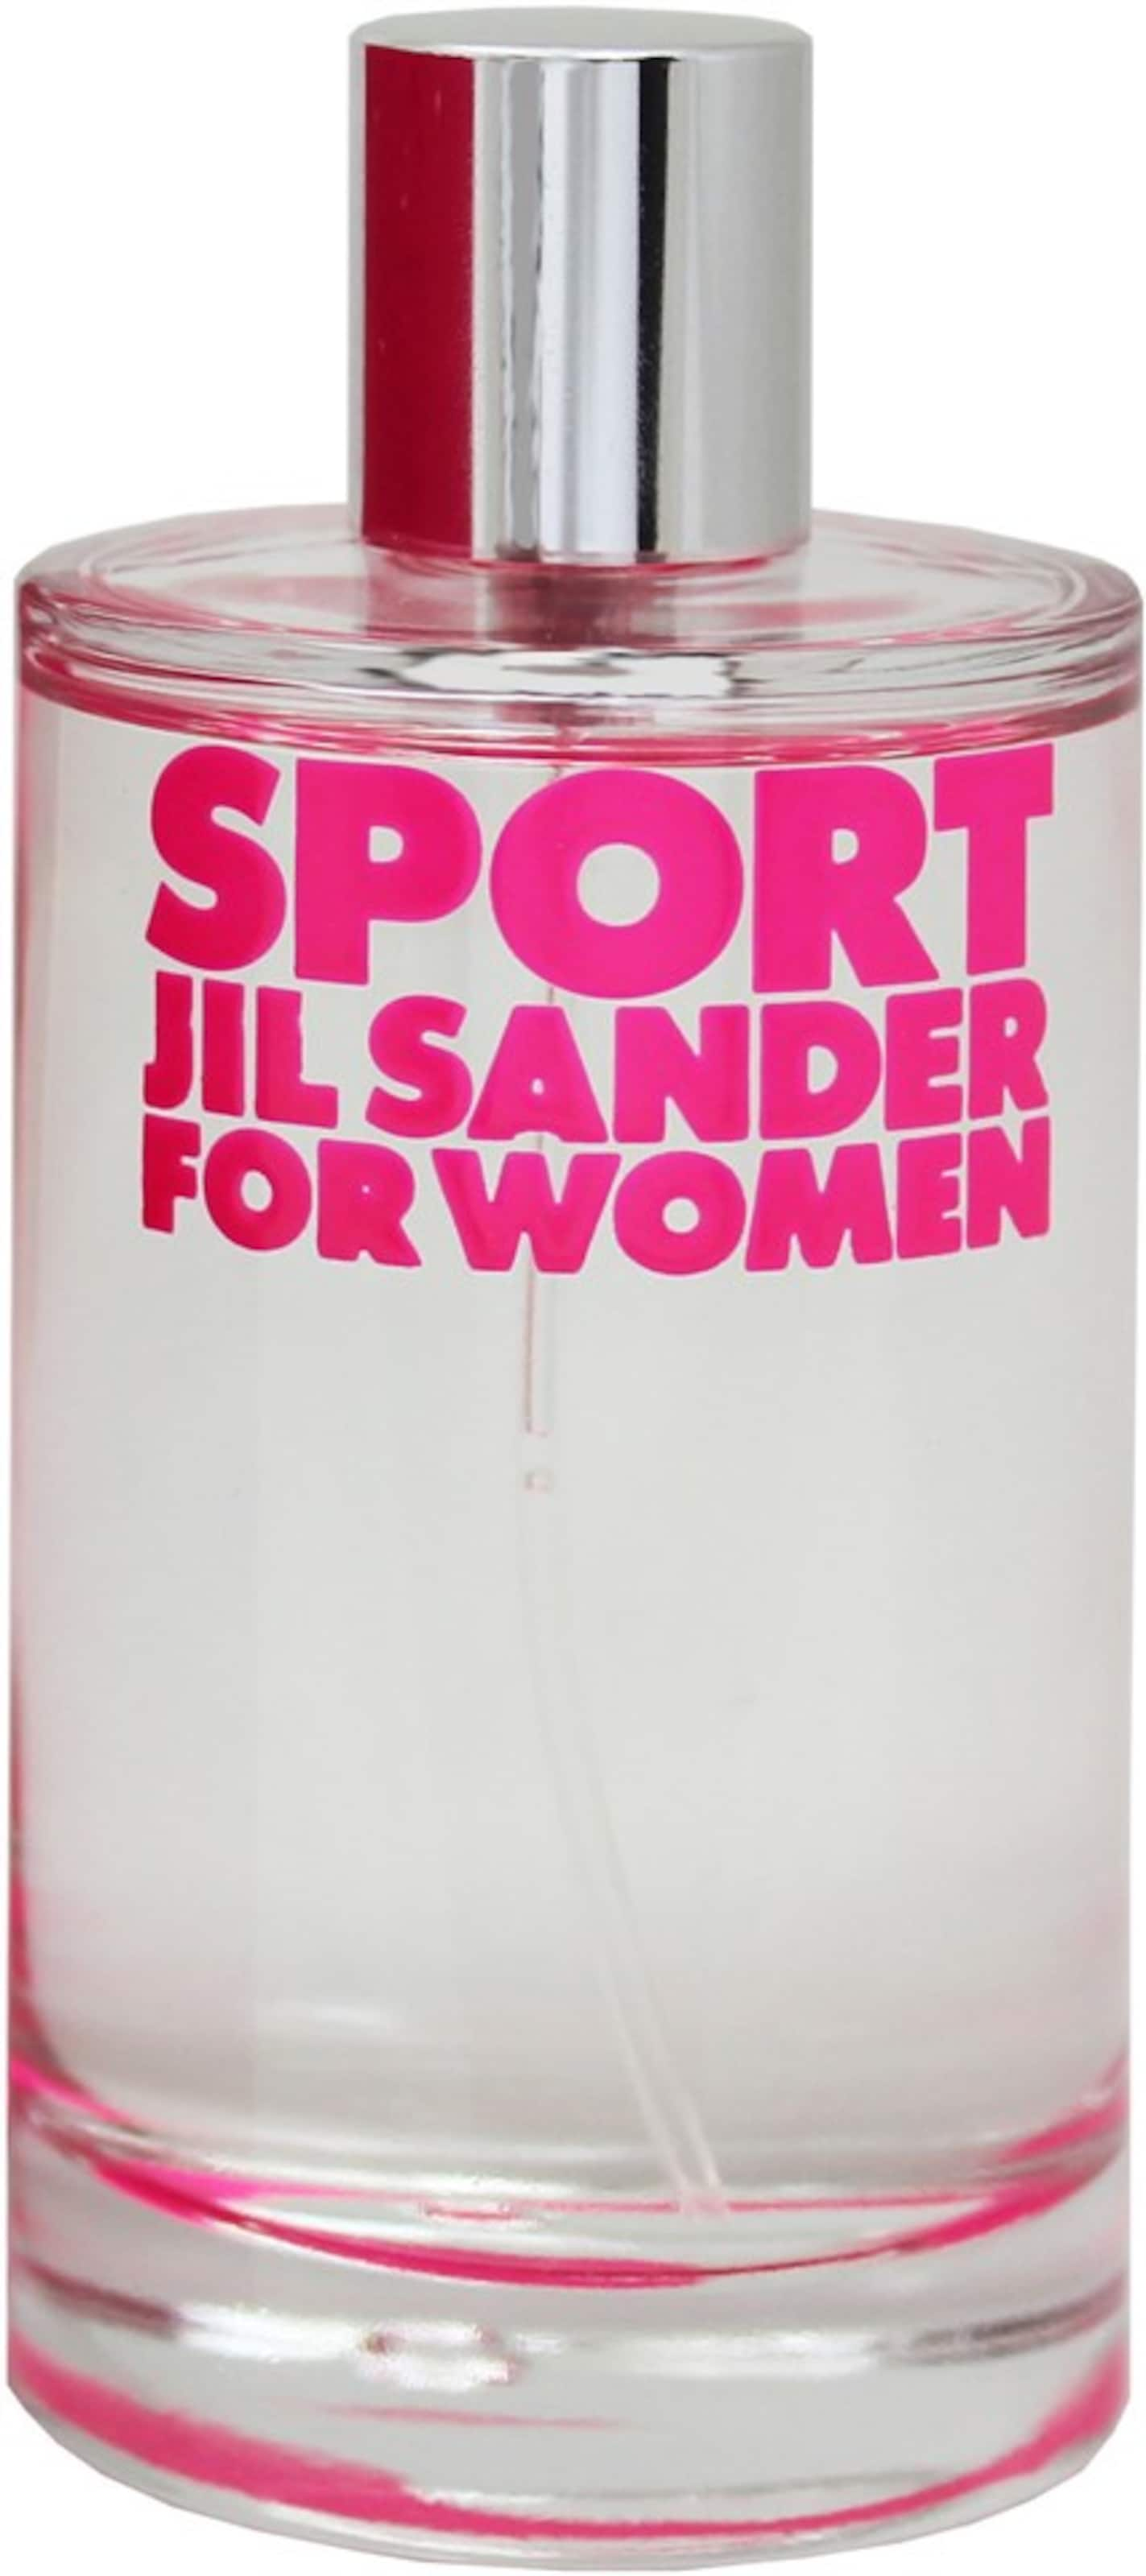 JIL SANDER 'Sport for Woman' Eau de Toilette Modisch Angebote Online Rabatt Nicekicks Freies Verschiffen Versorgung WymELb